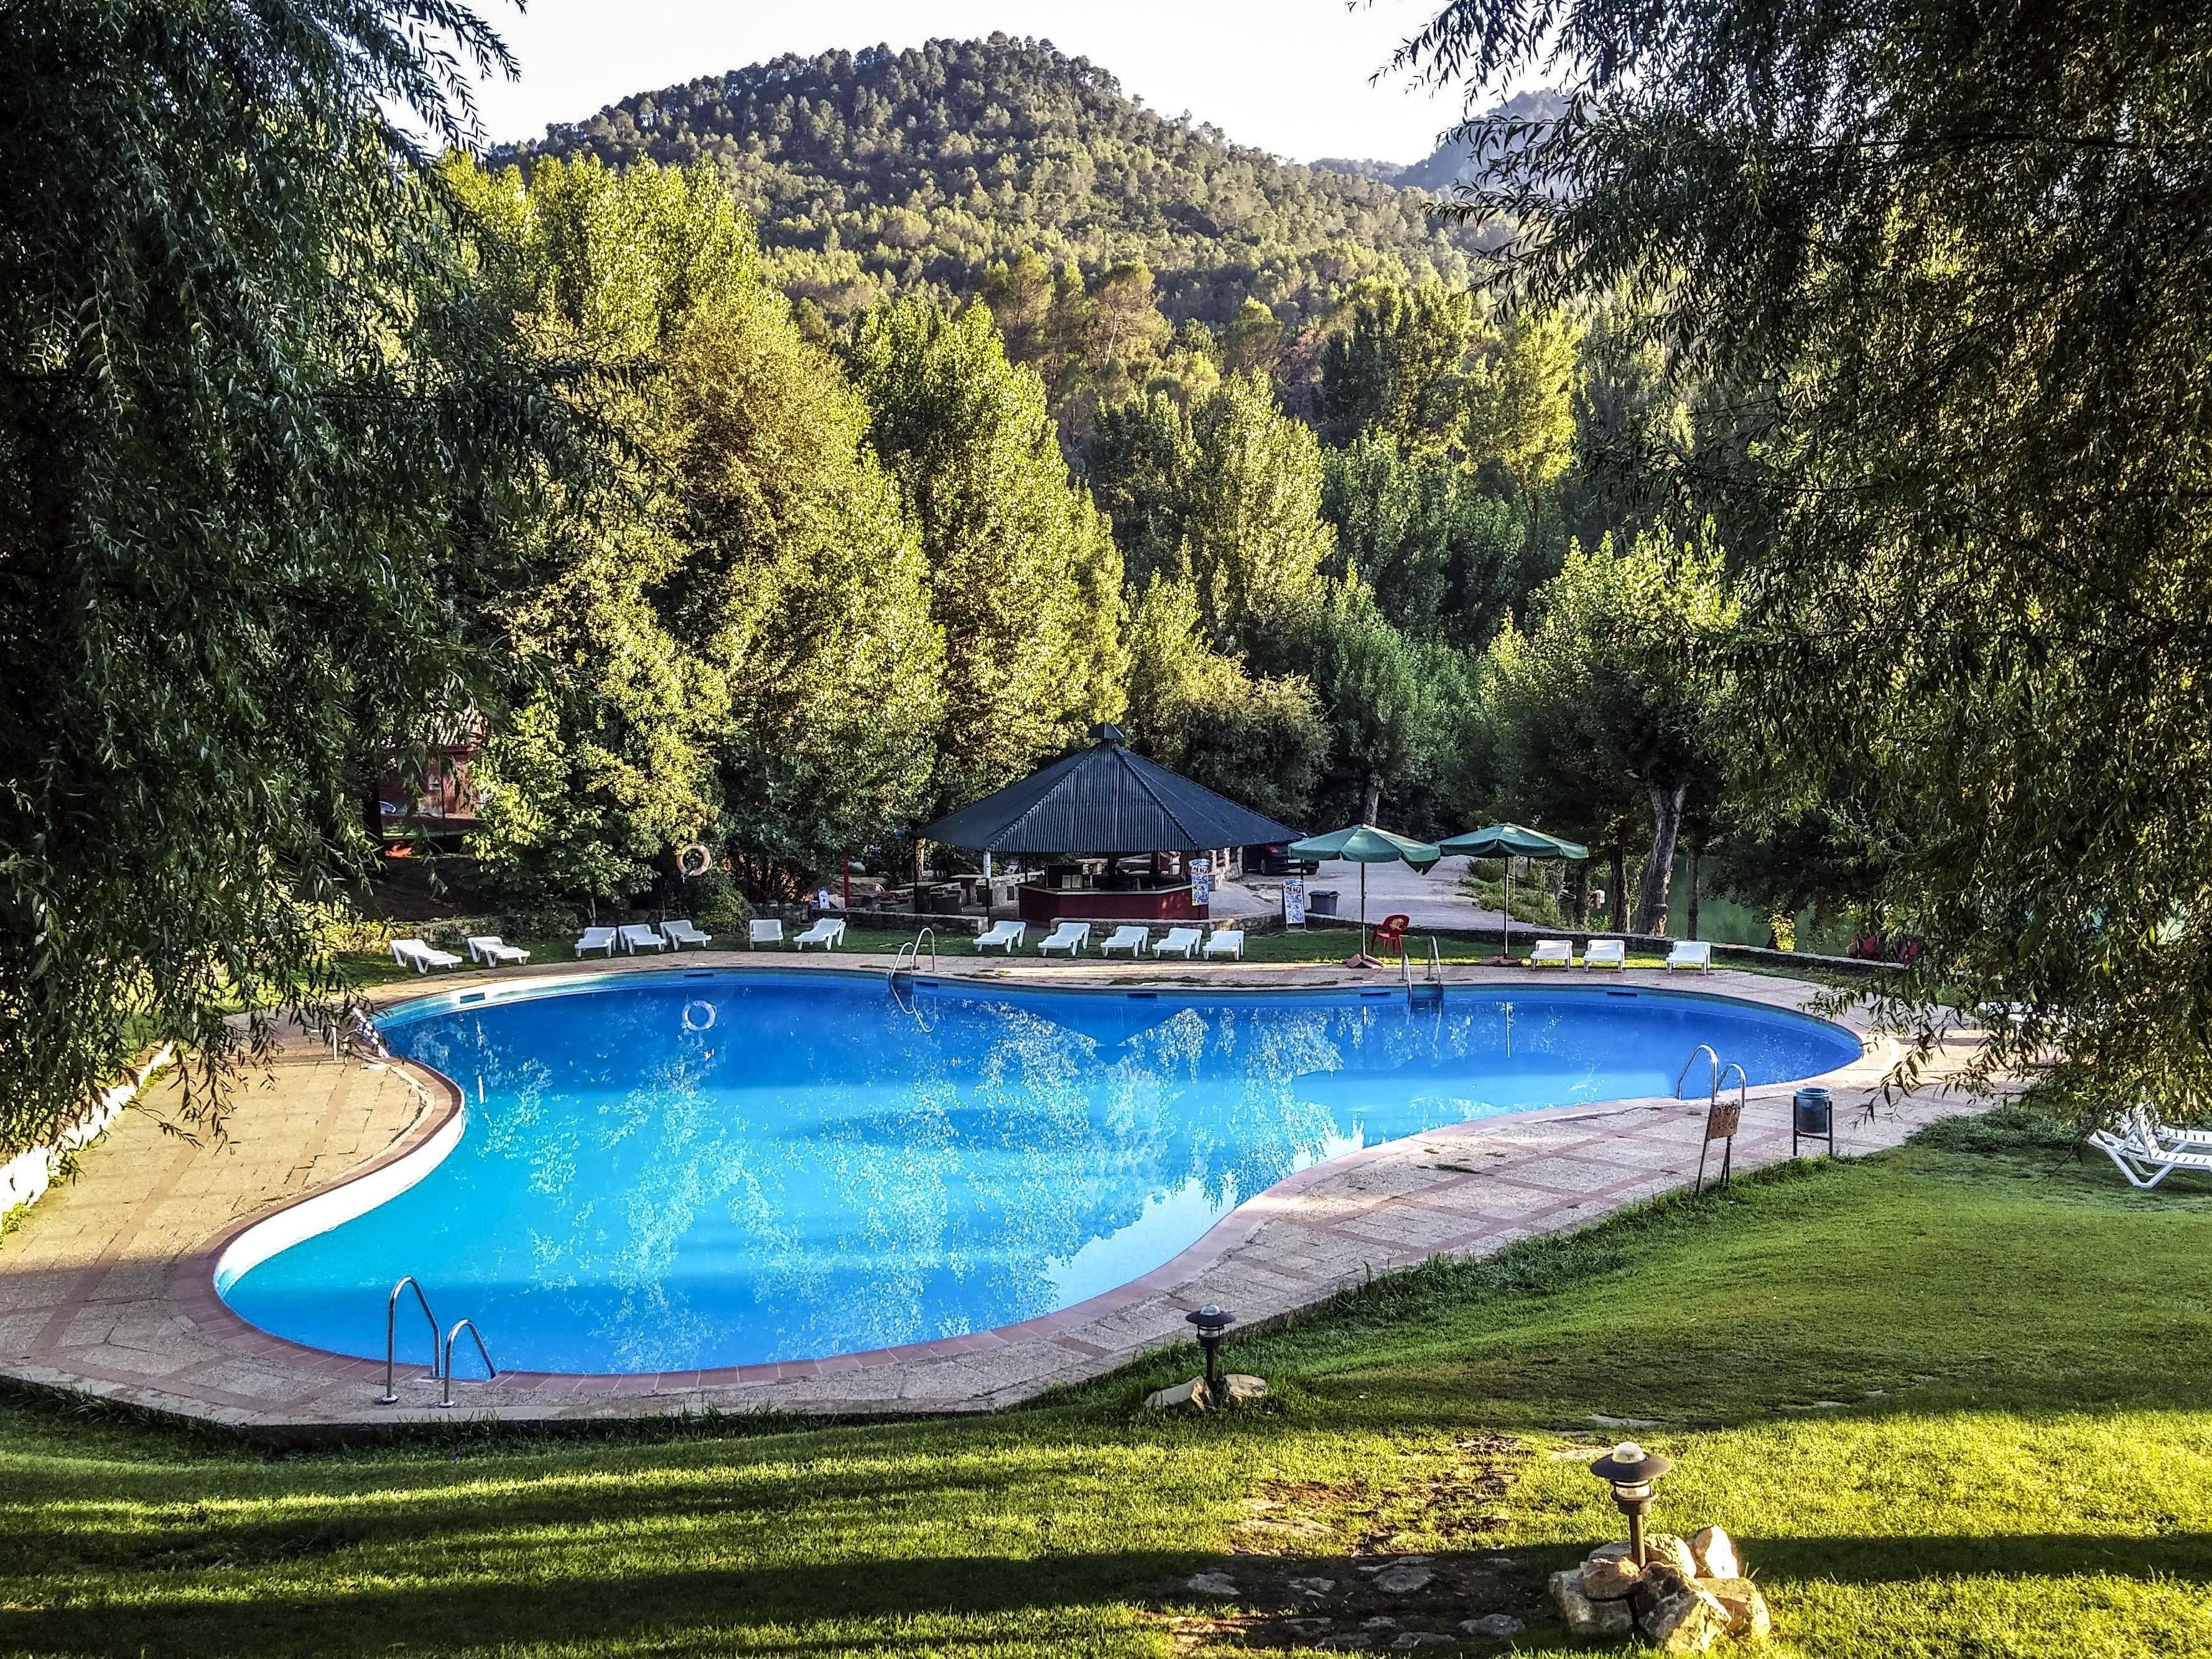 Swimming Pool Travel : Free picture swimming pool resort paradise hotel